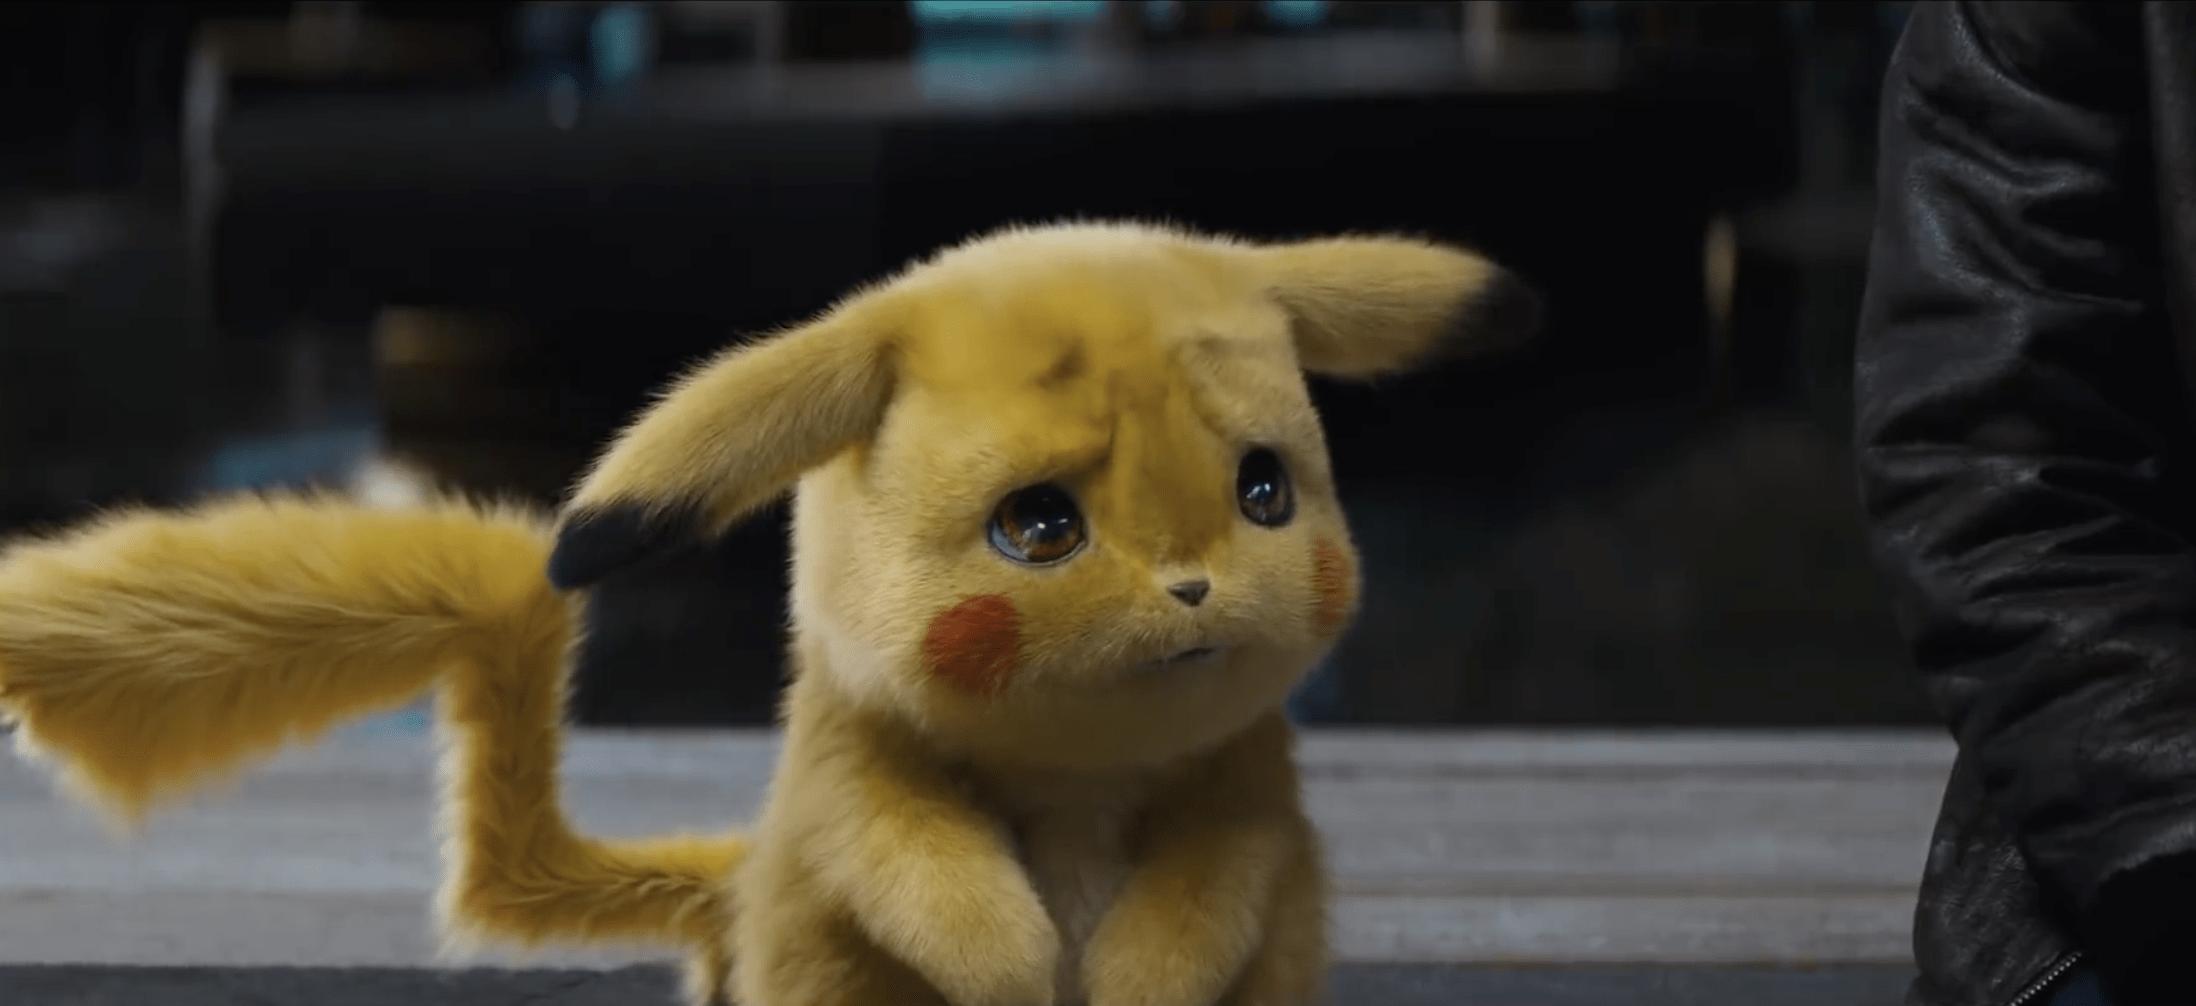 Detective Pikachu Wallpapers Top Free Detective Pikachu